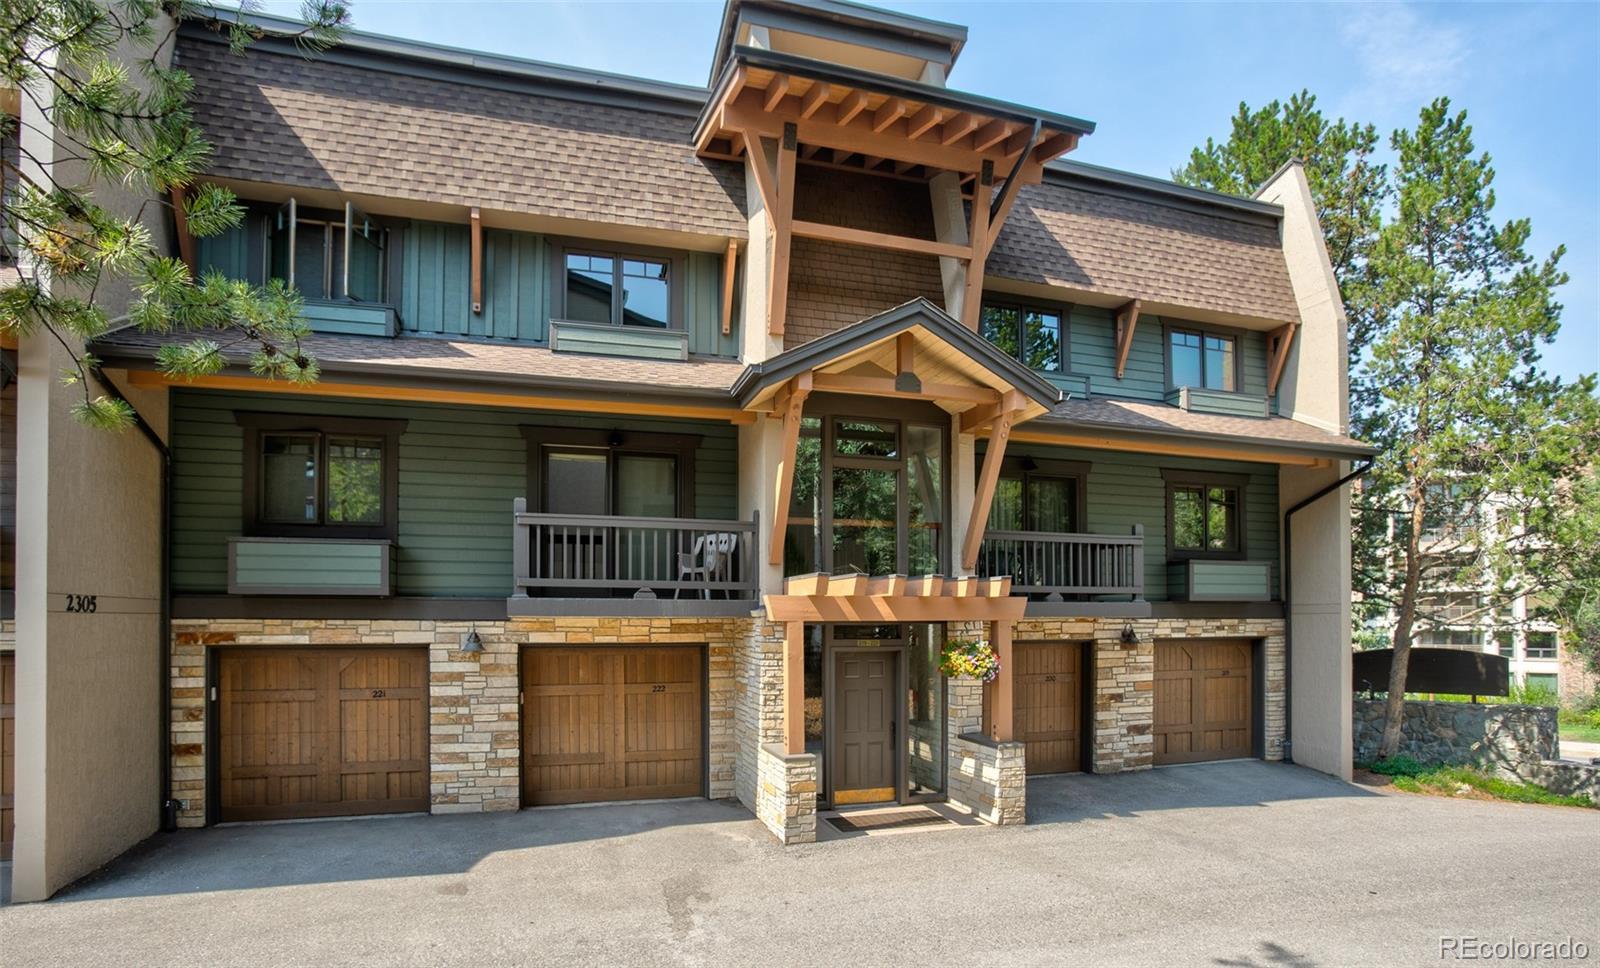 2305 Apres Ski Way 221 Property Photo 1